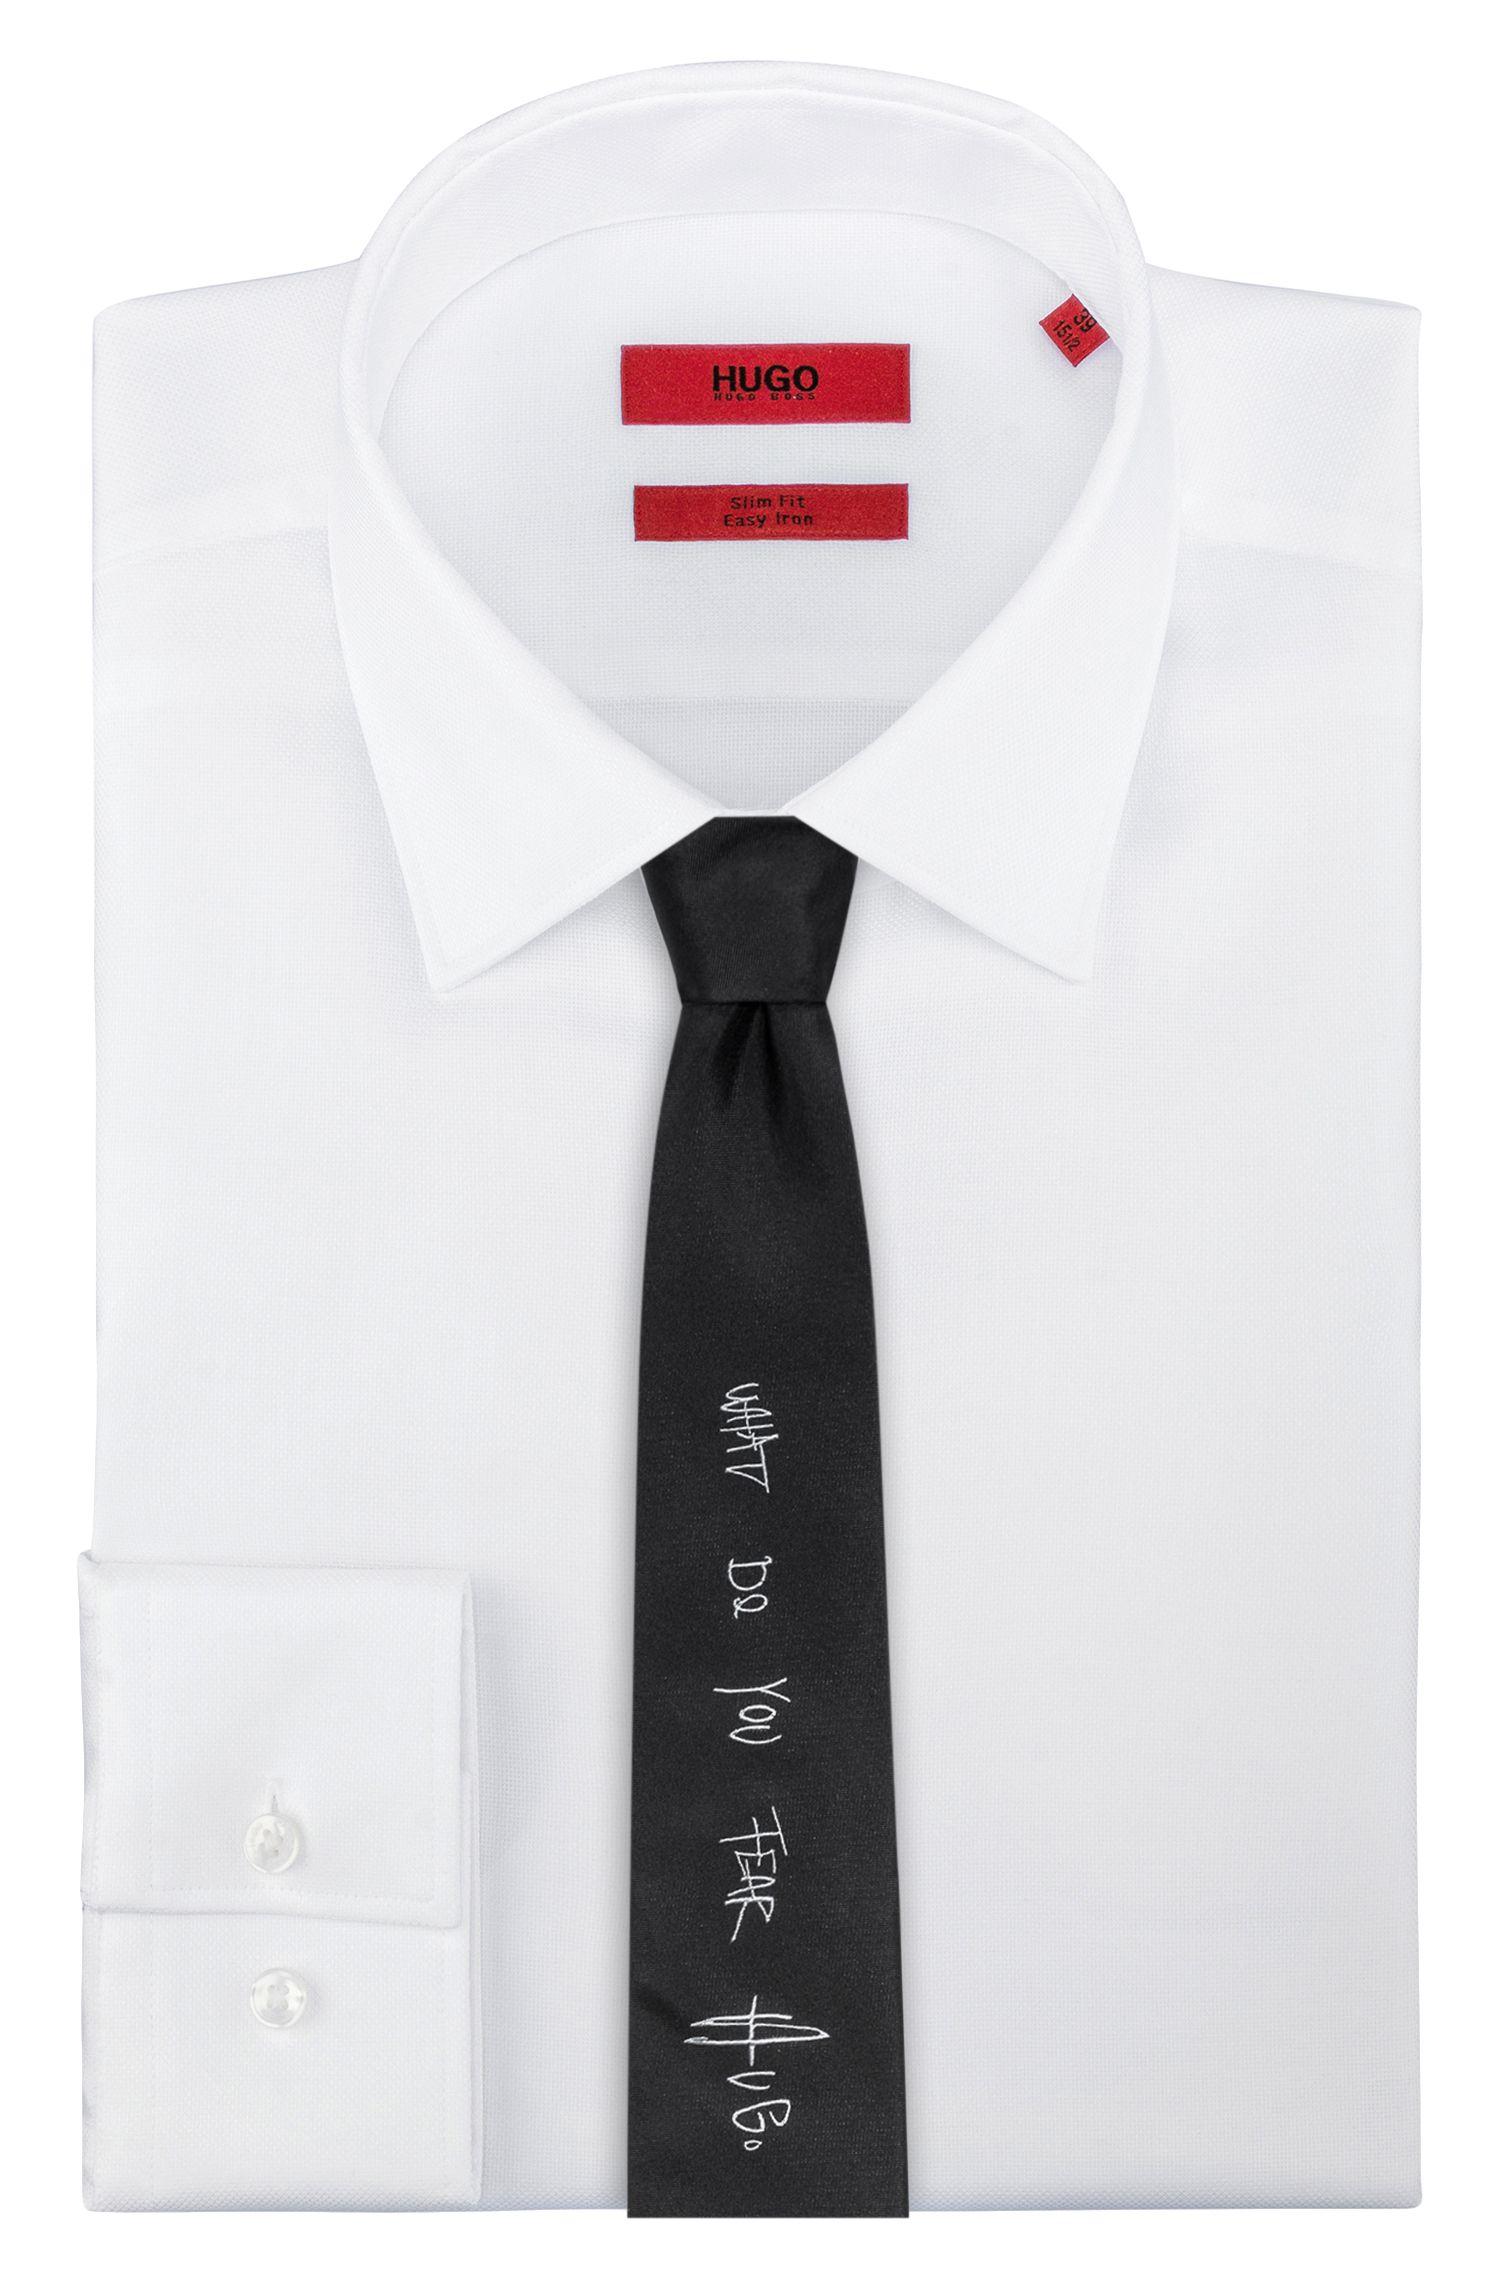 Straight-cut silk jacquard tie with urban slogan HUGO BOSS